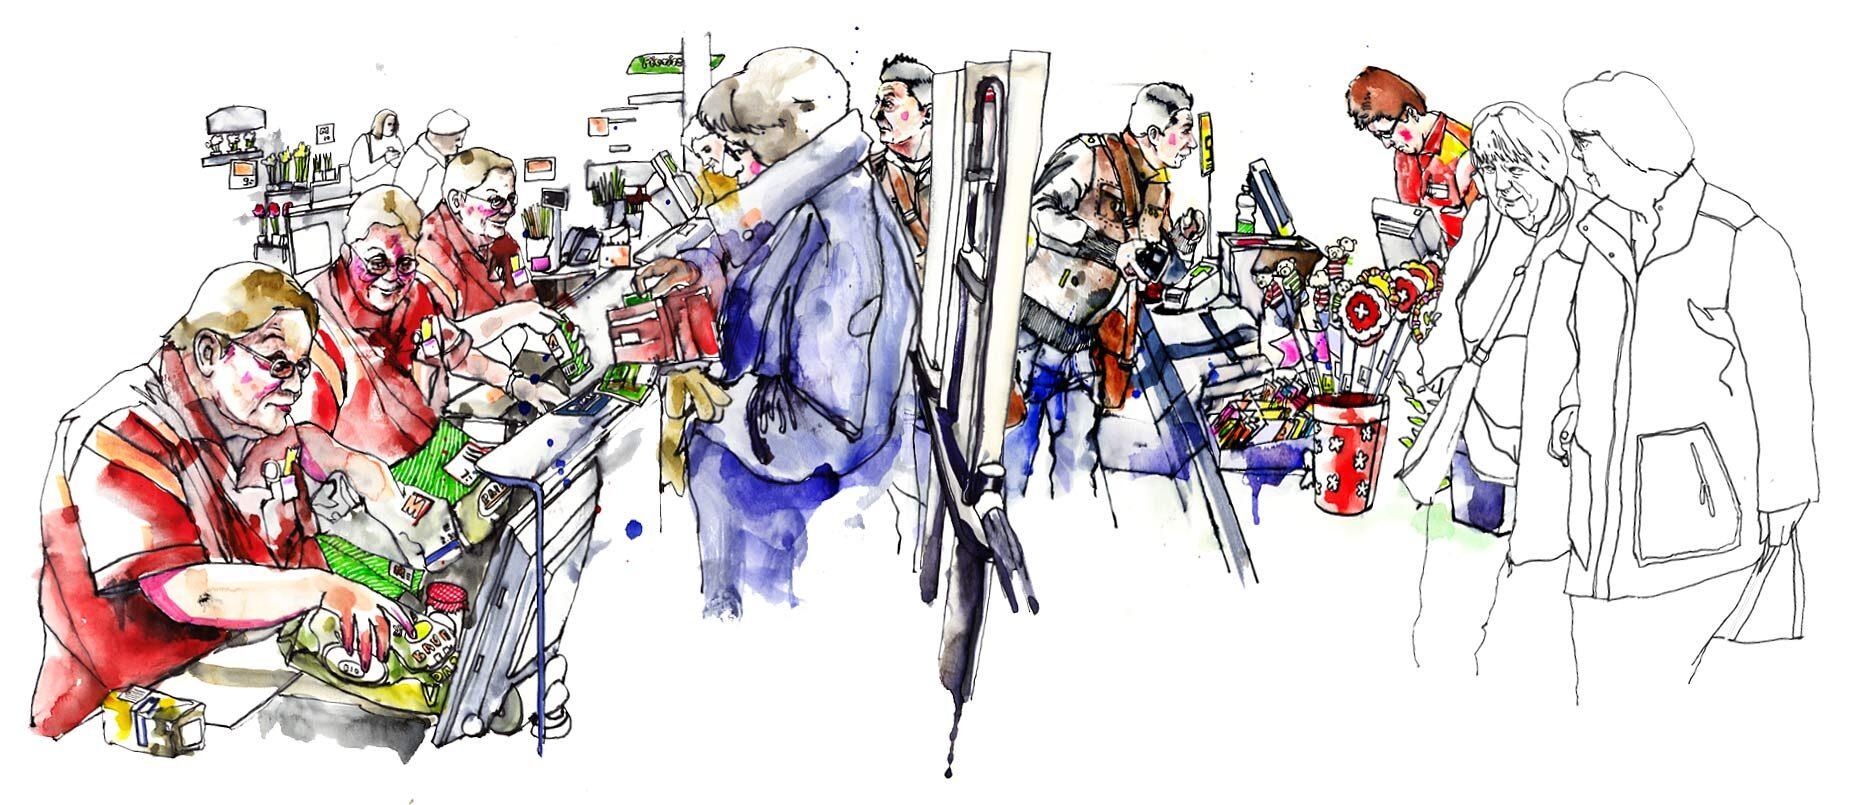 Migros - Kornel Illustration | Kornel Stadler portfolio